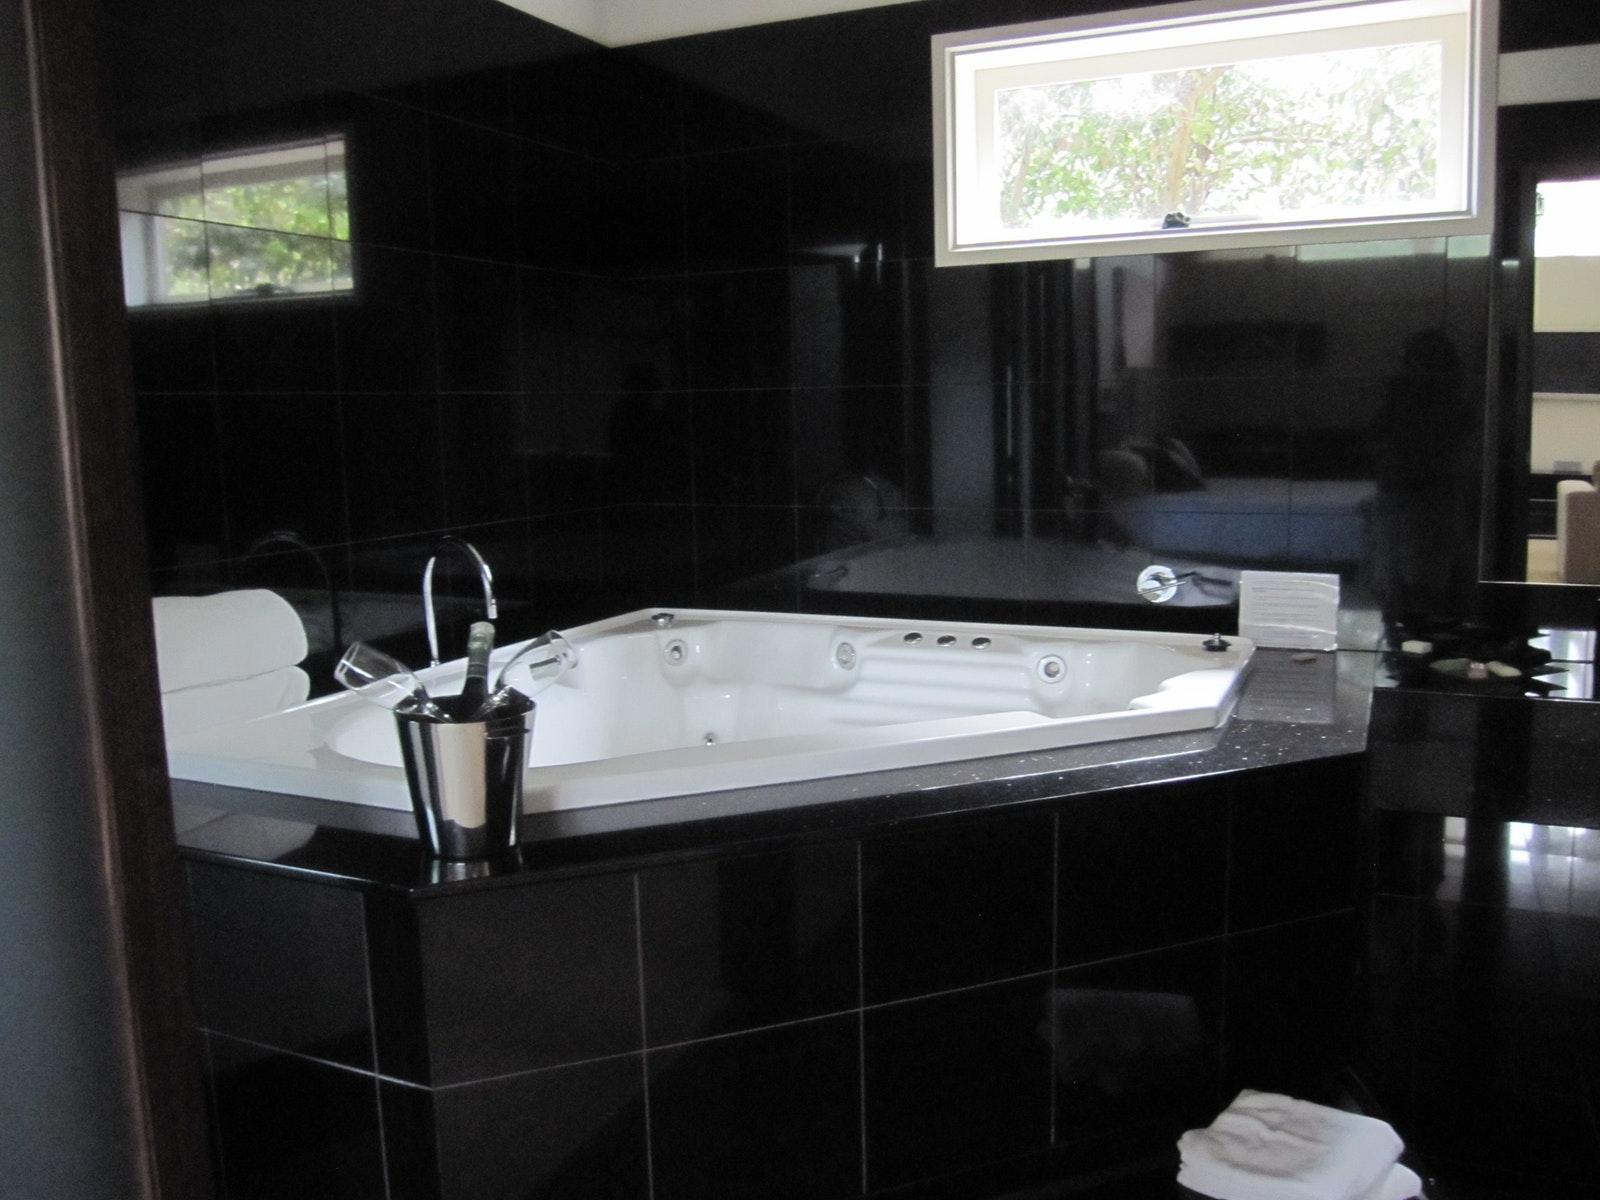 Enjoy a relaxing spa bath